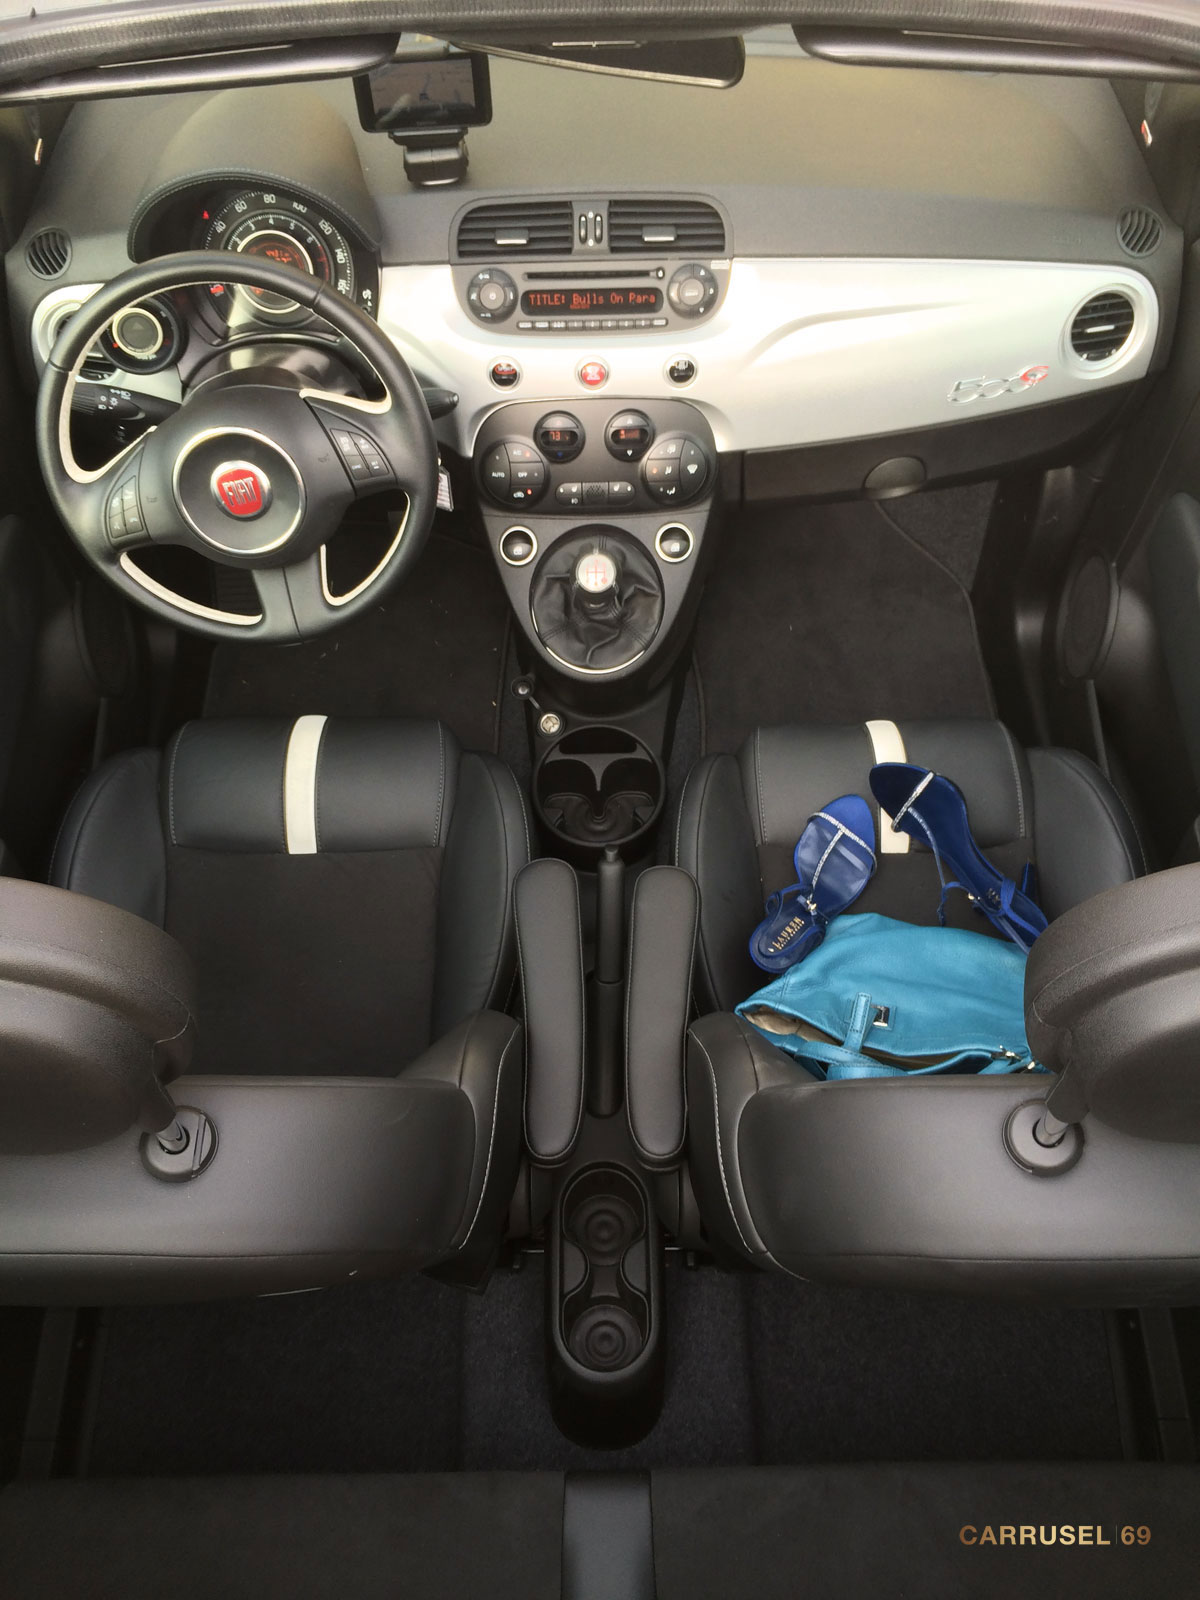 Fiat-500C-GQ-2014-11.jpg